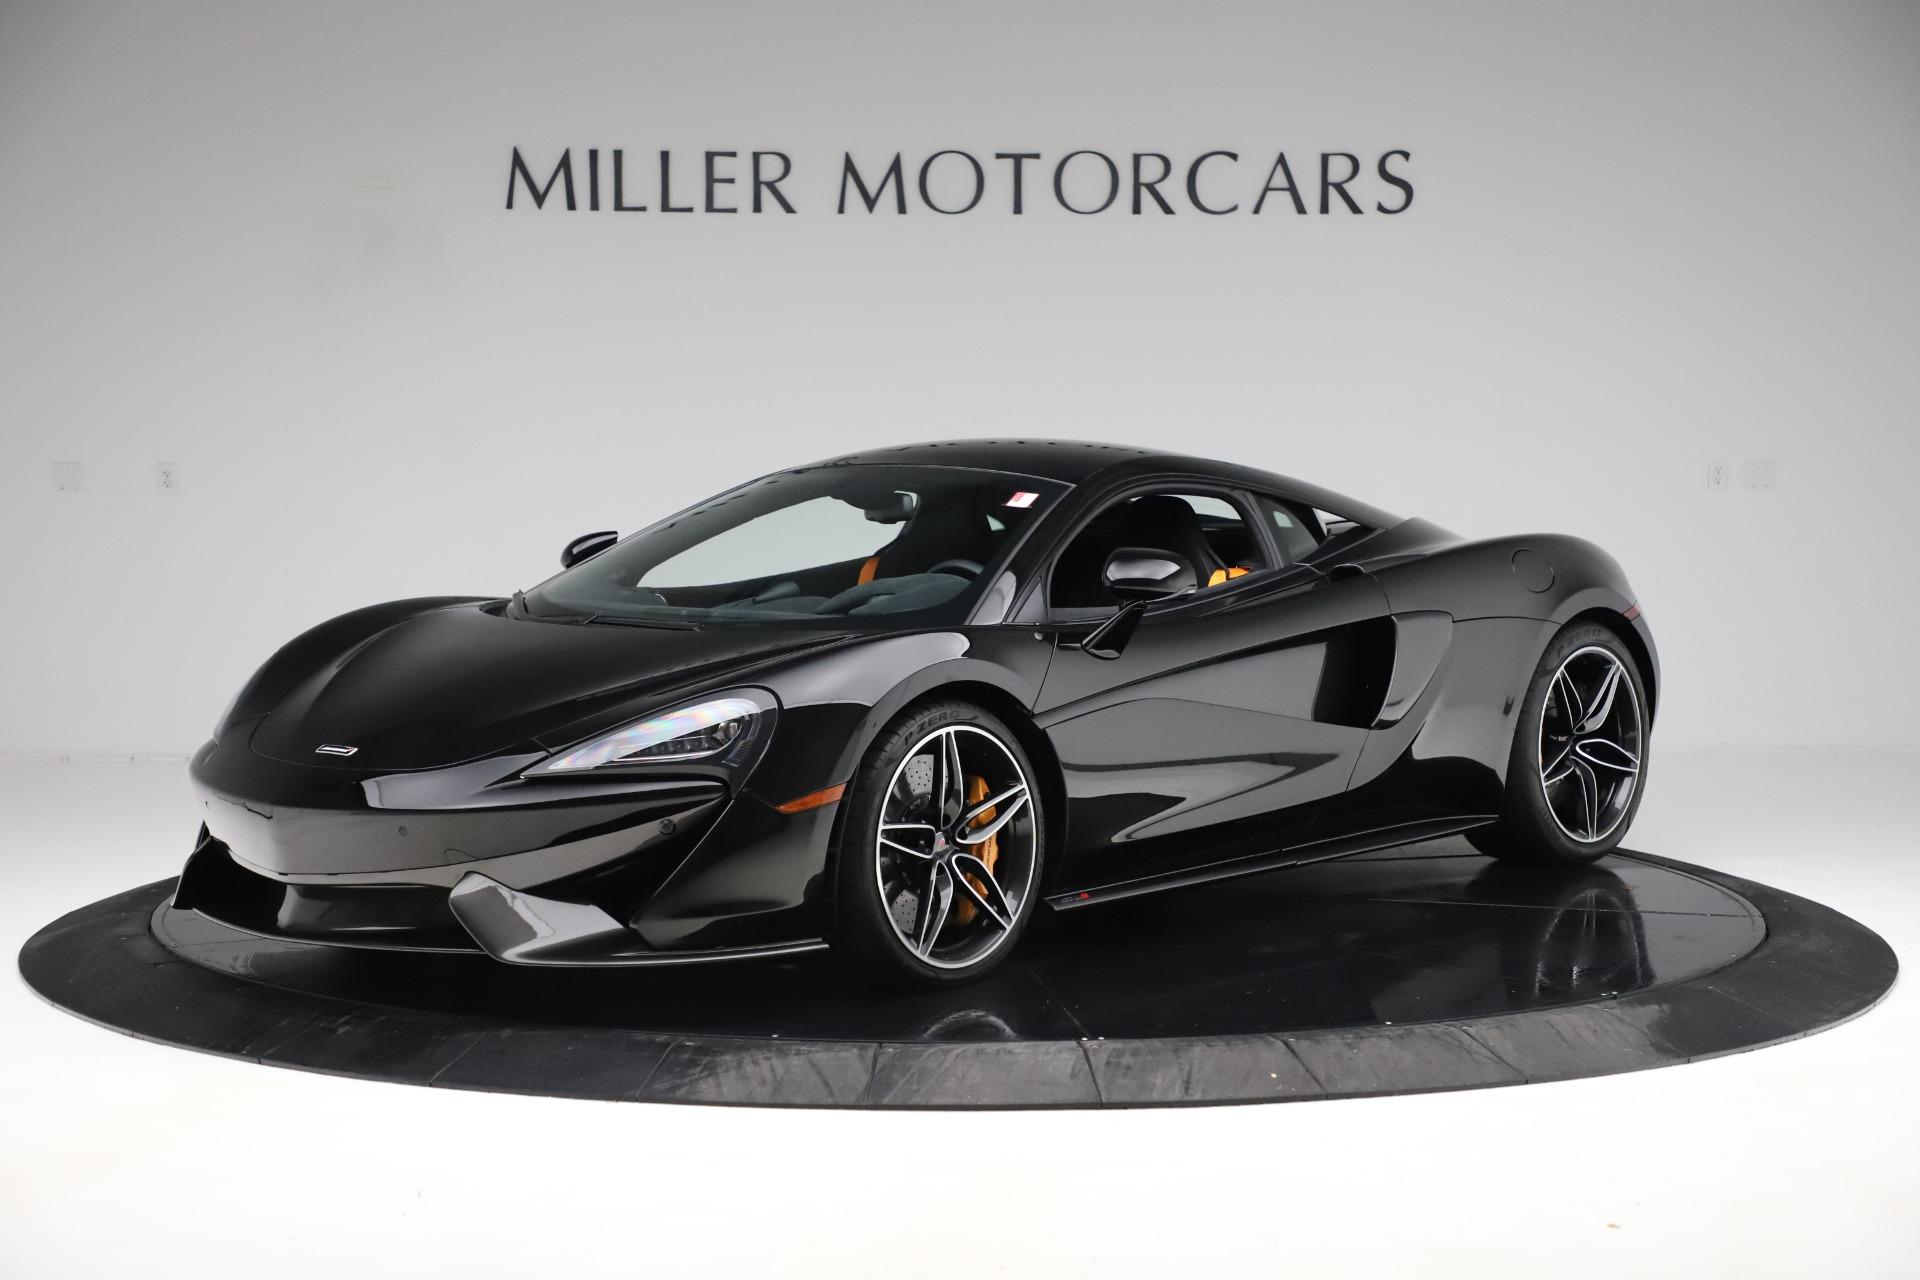 Used 2017 McLaren 570S Coupe for sale Call for price at Alfa Romeo of Westport in Westport CT 06880 1